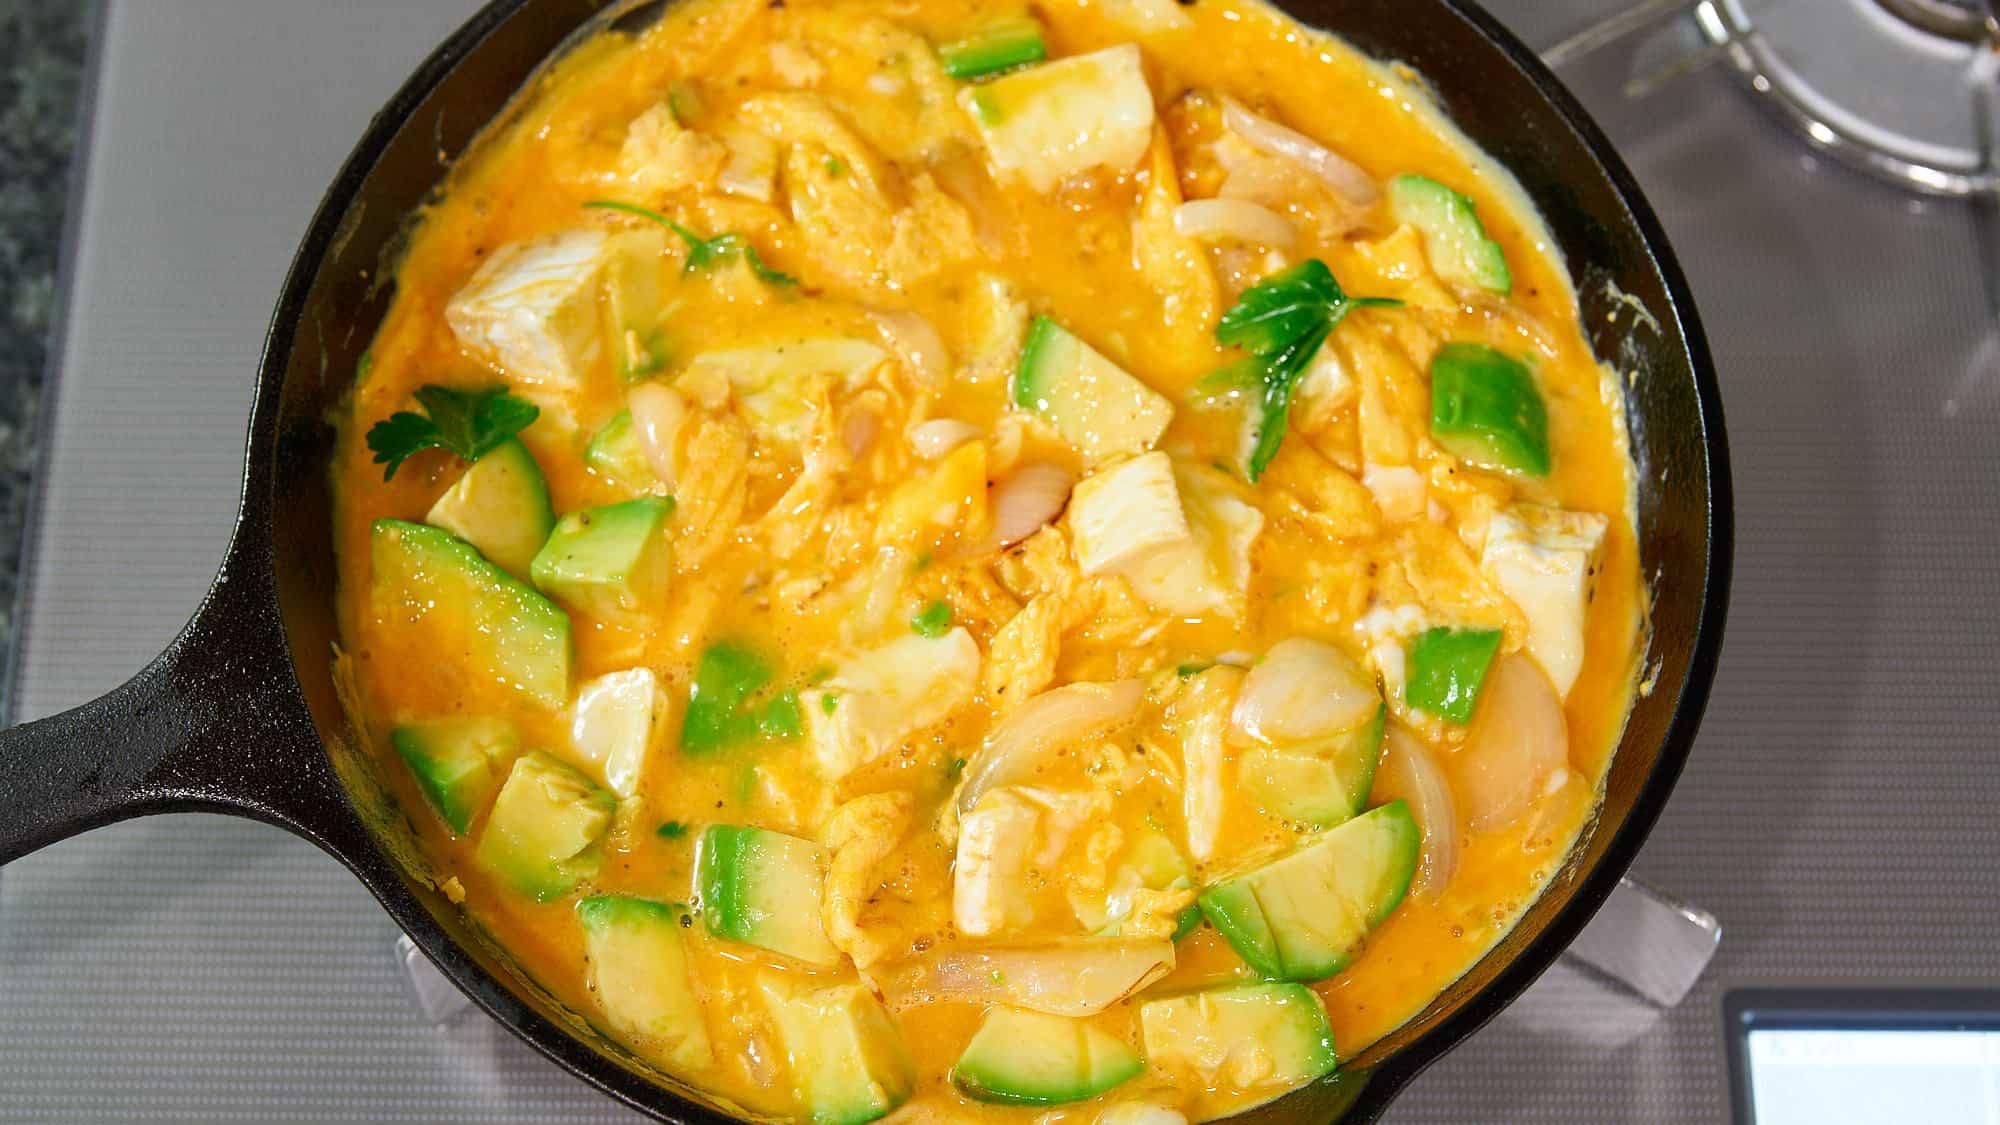 Avocado camembert and caramelized onion frittata recipe